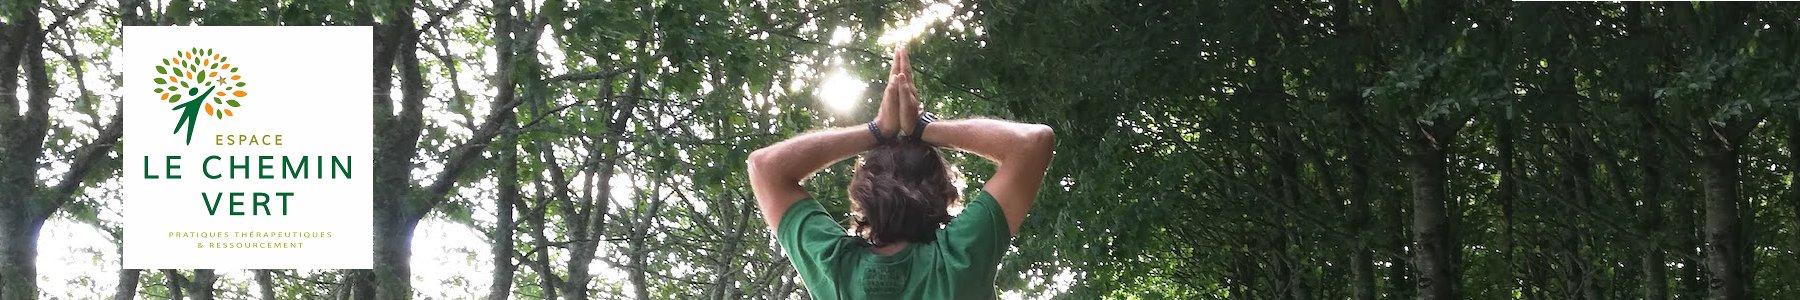 Professeurs de yoga, méditation